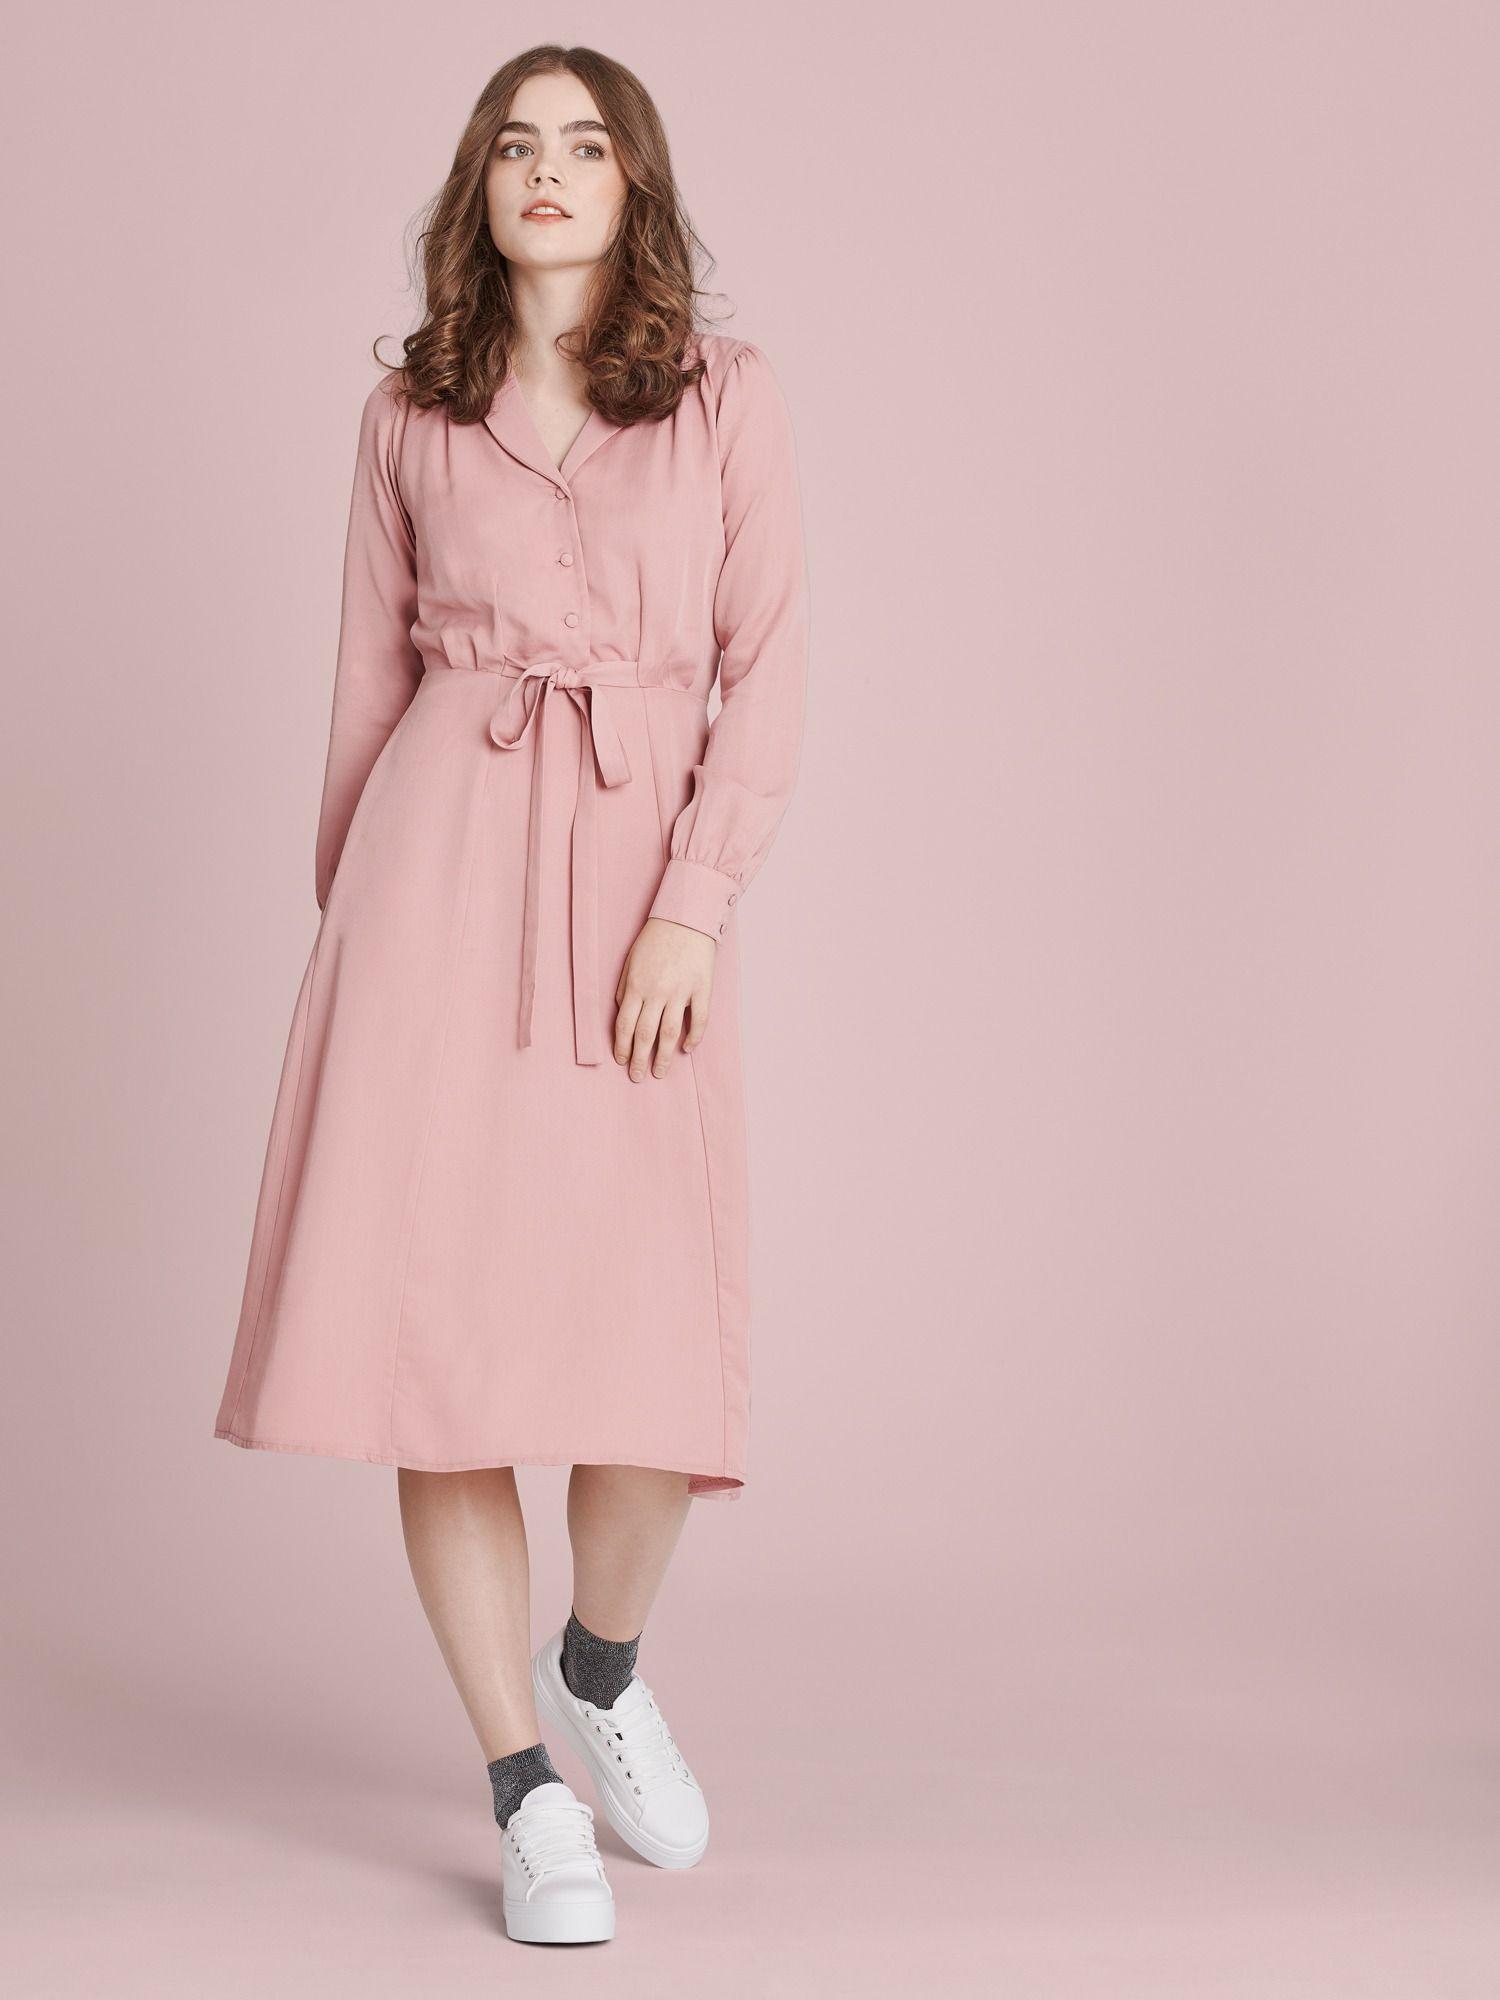 Coffee With Cream Kleid  Pink  Pinkes Kleid Kleider